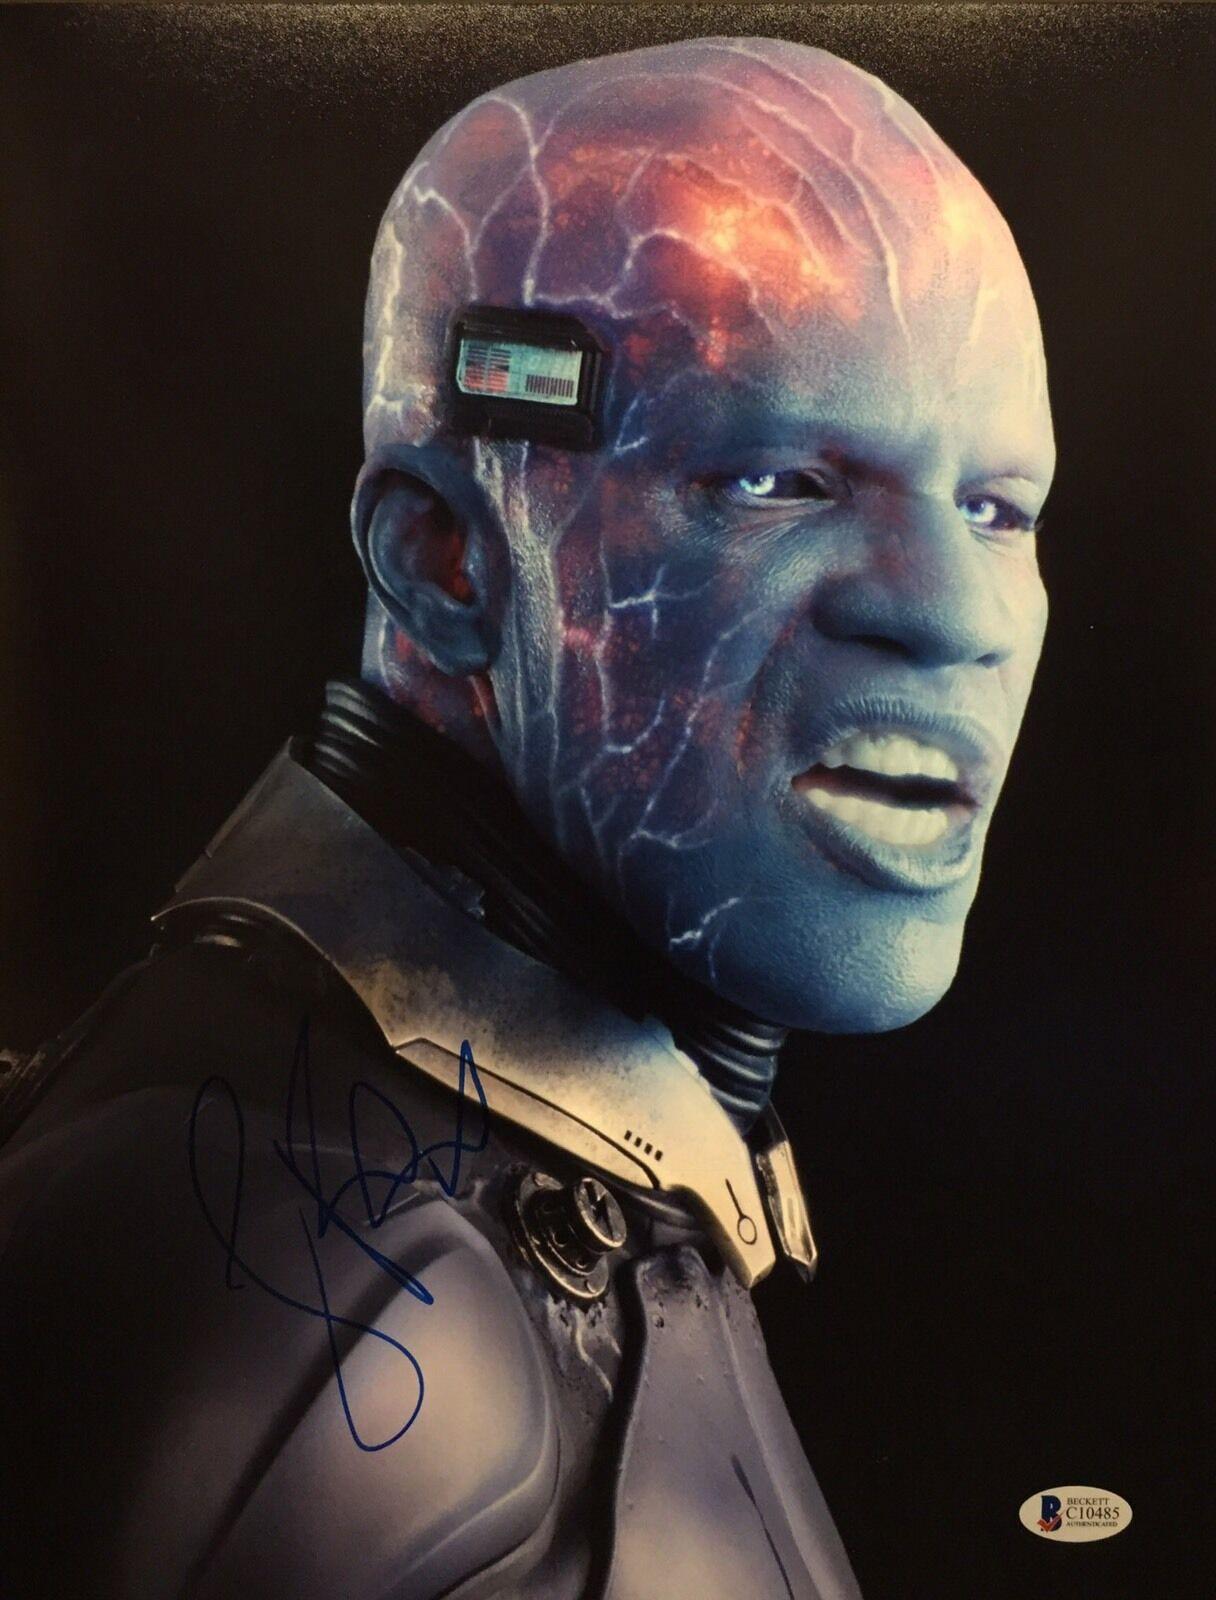 Jamie Foxx Signed The Amazing Spiderman 2 11x14 Photo Electro Beckett BAS C10485